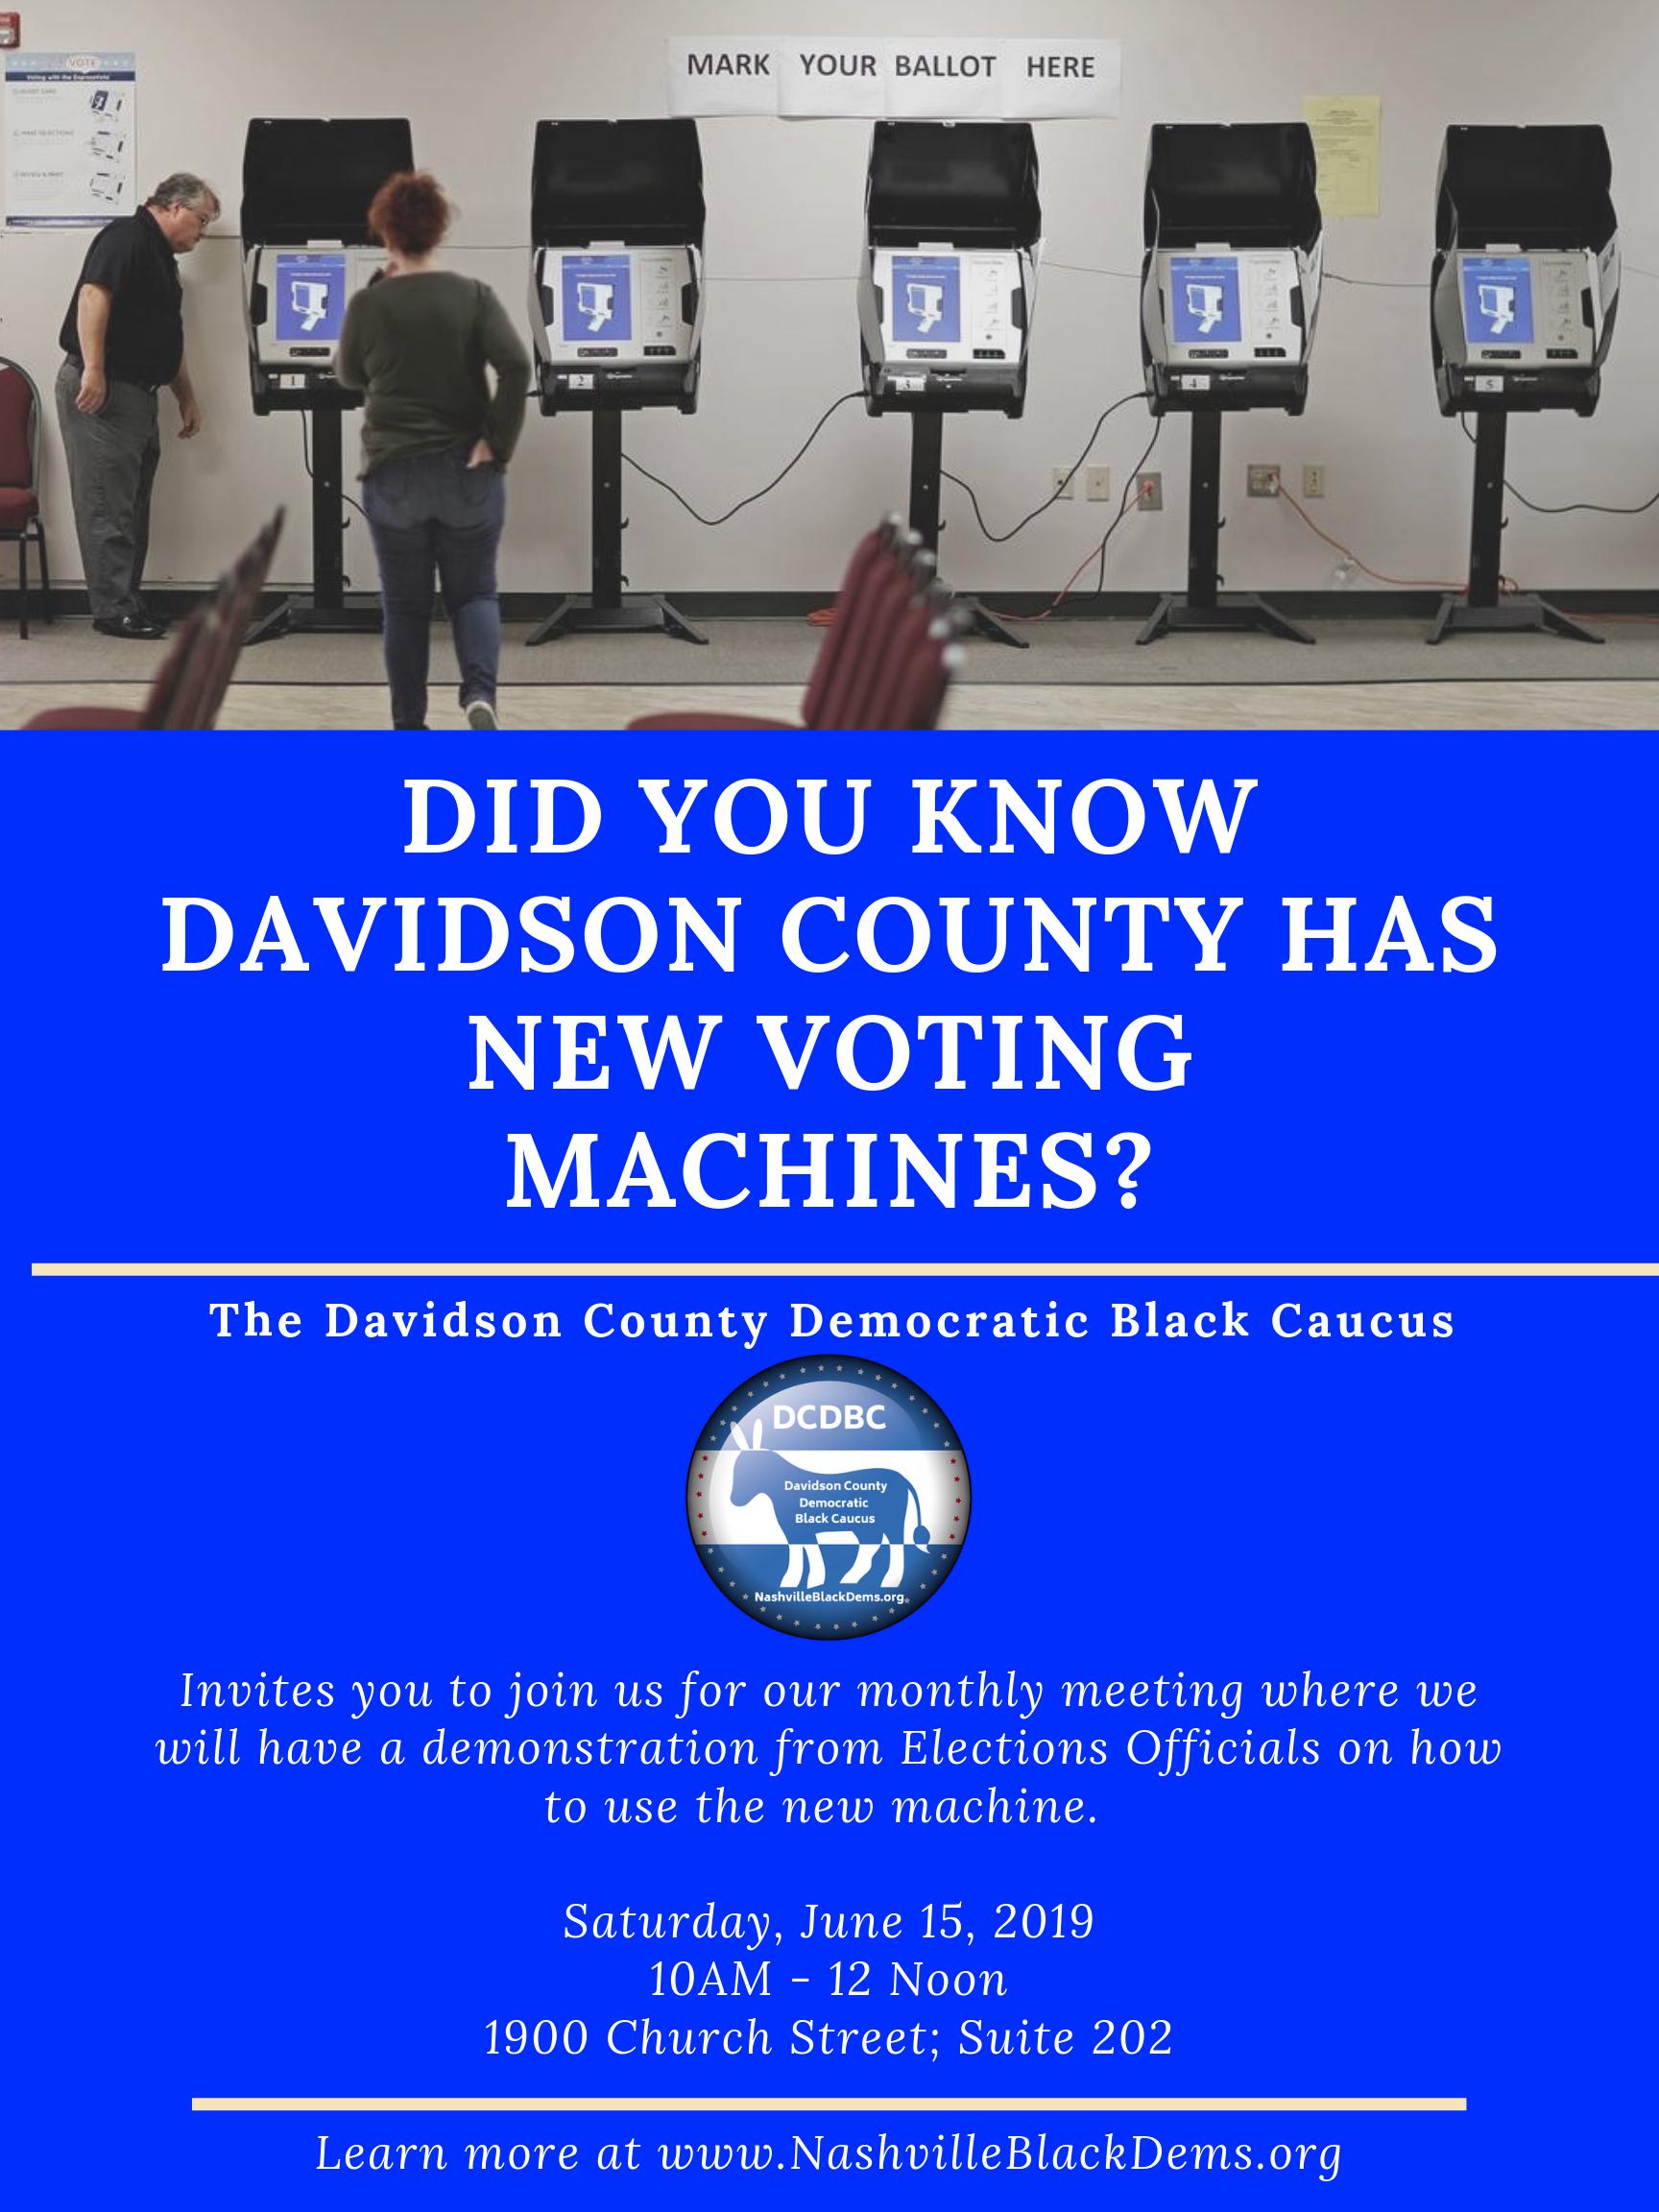 DCDBC_Voting_Machine_June_Flyer_(2).png